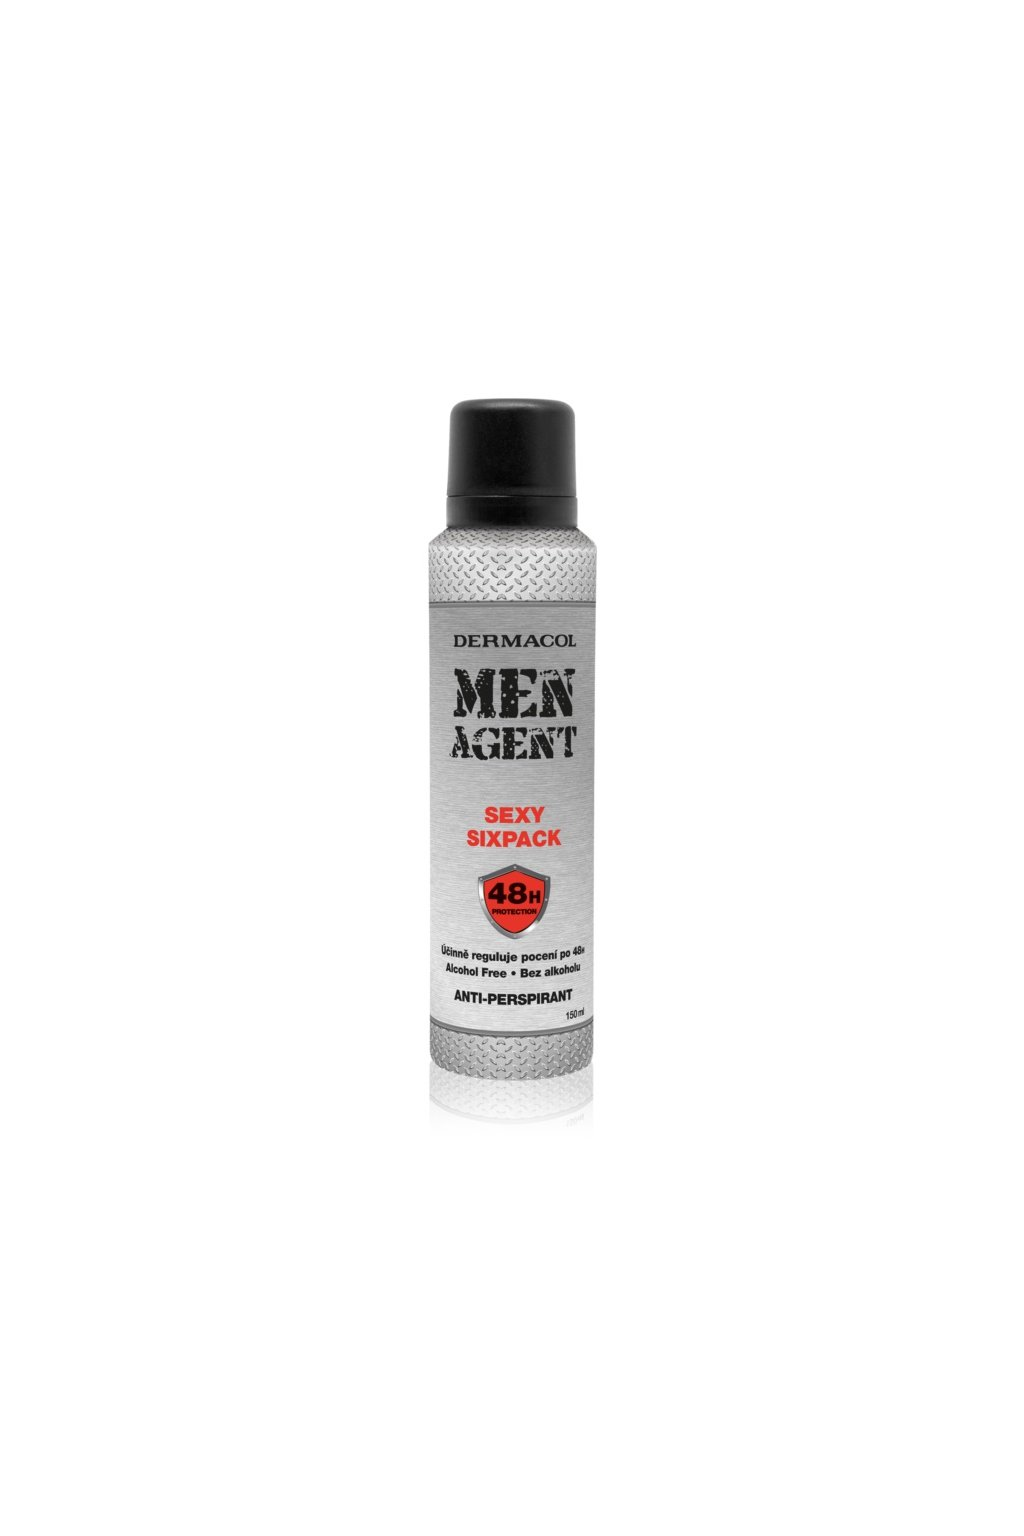 dermacol men agent sexy sixpack antiperspirant 5